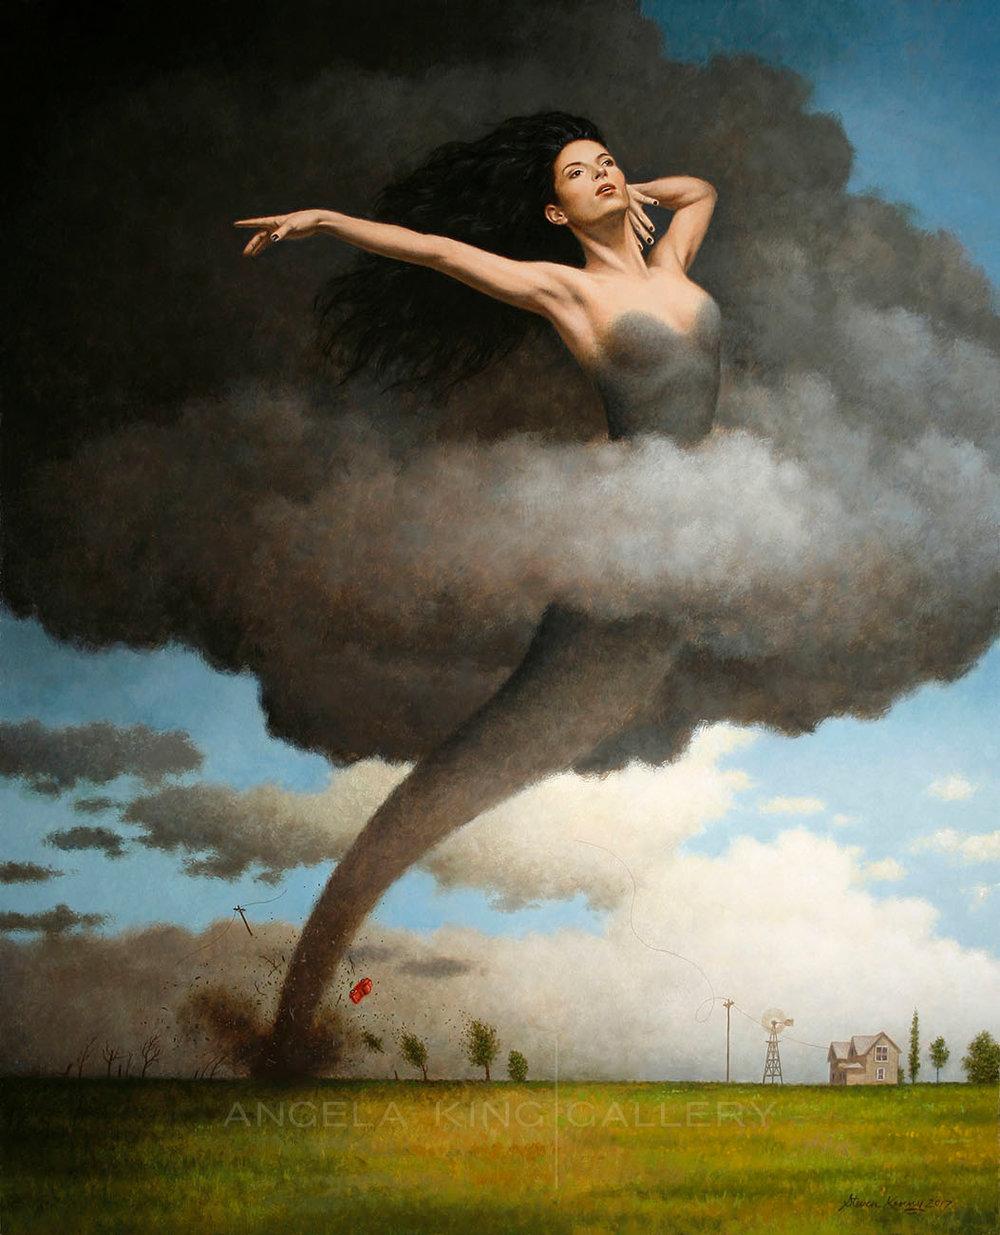 The Tornado*